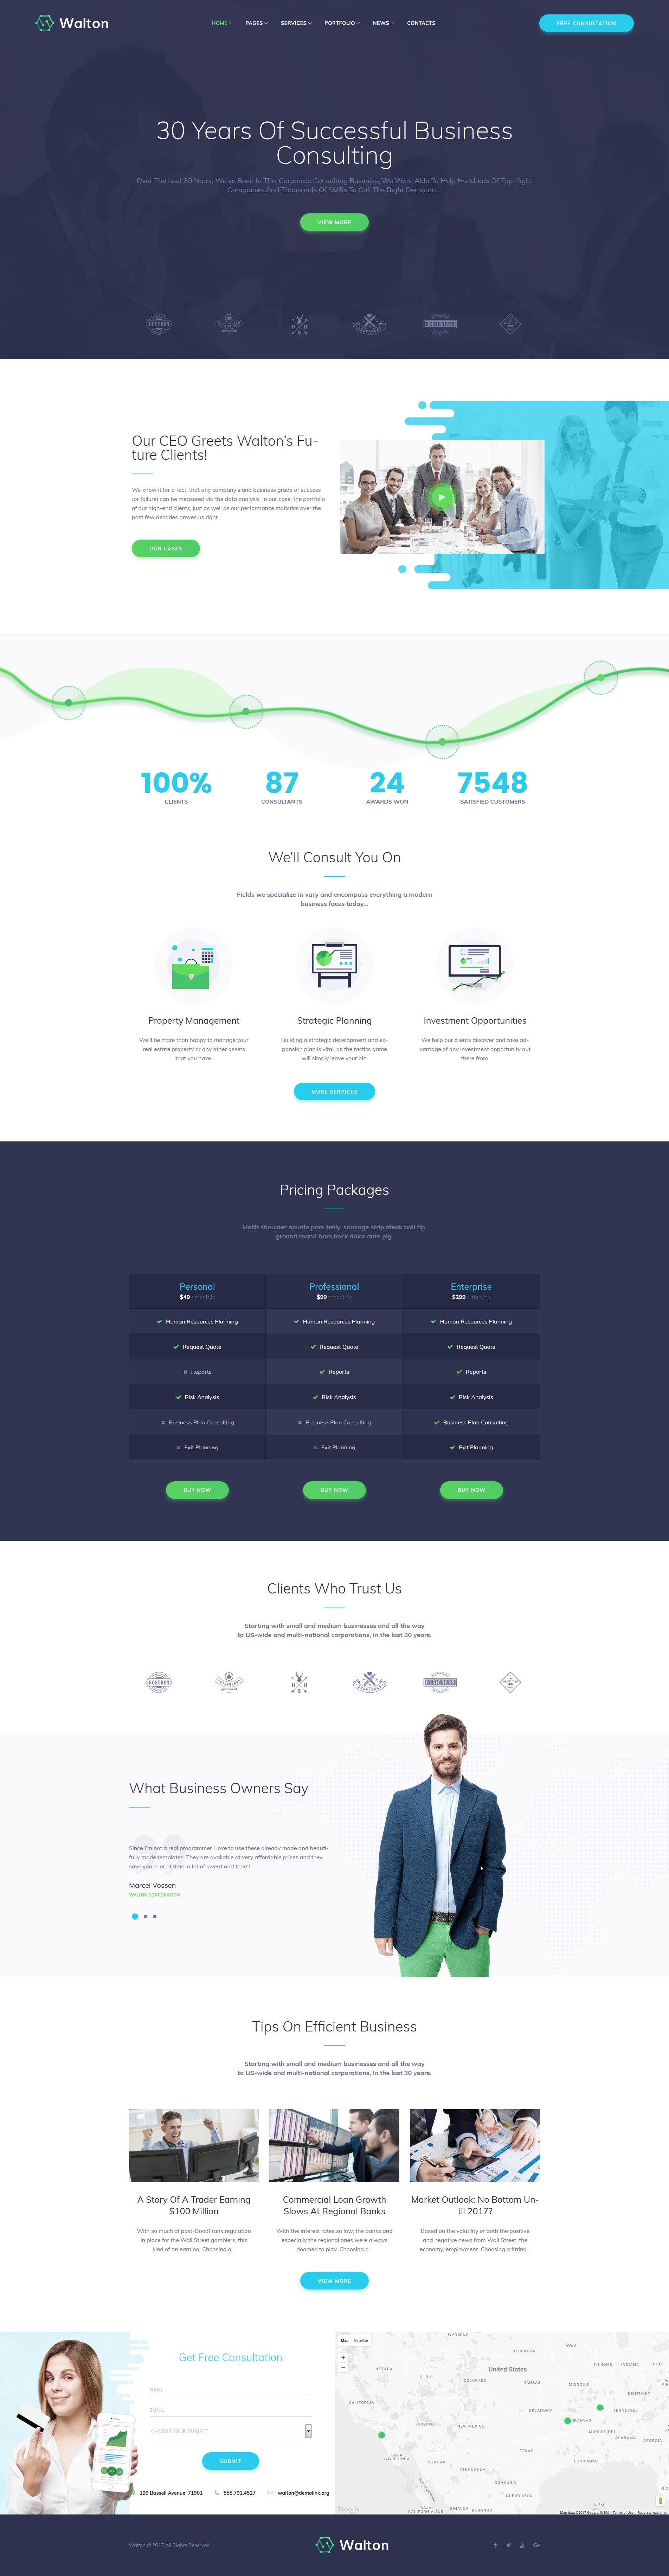 Walton - Finance & Consulting Corporate WordPress Theme - screenshot